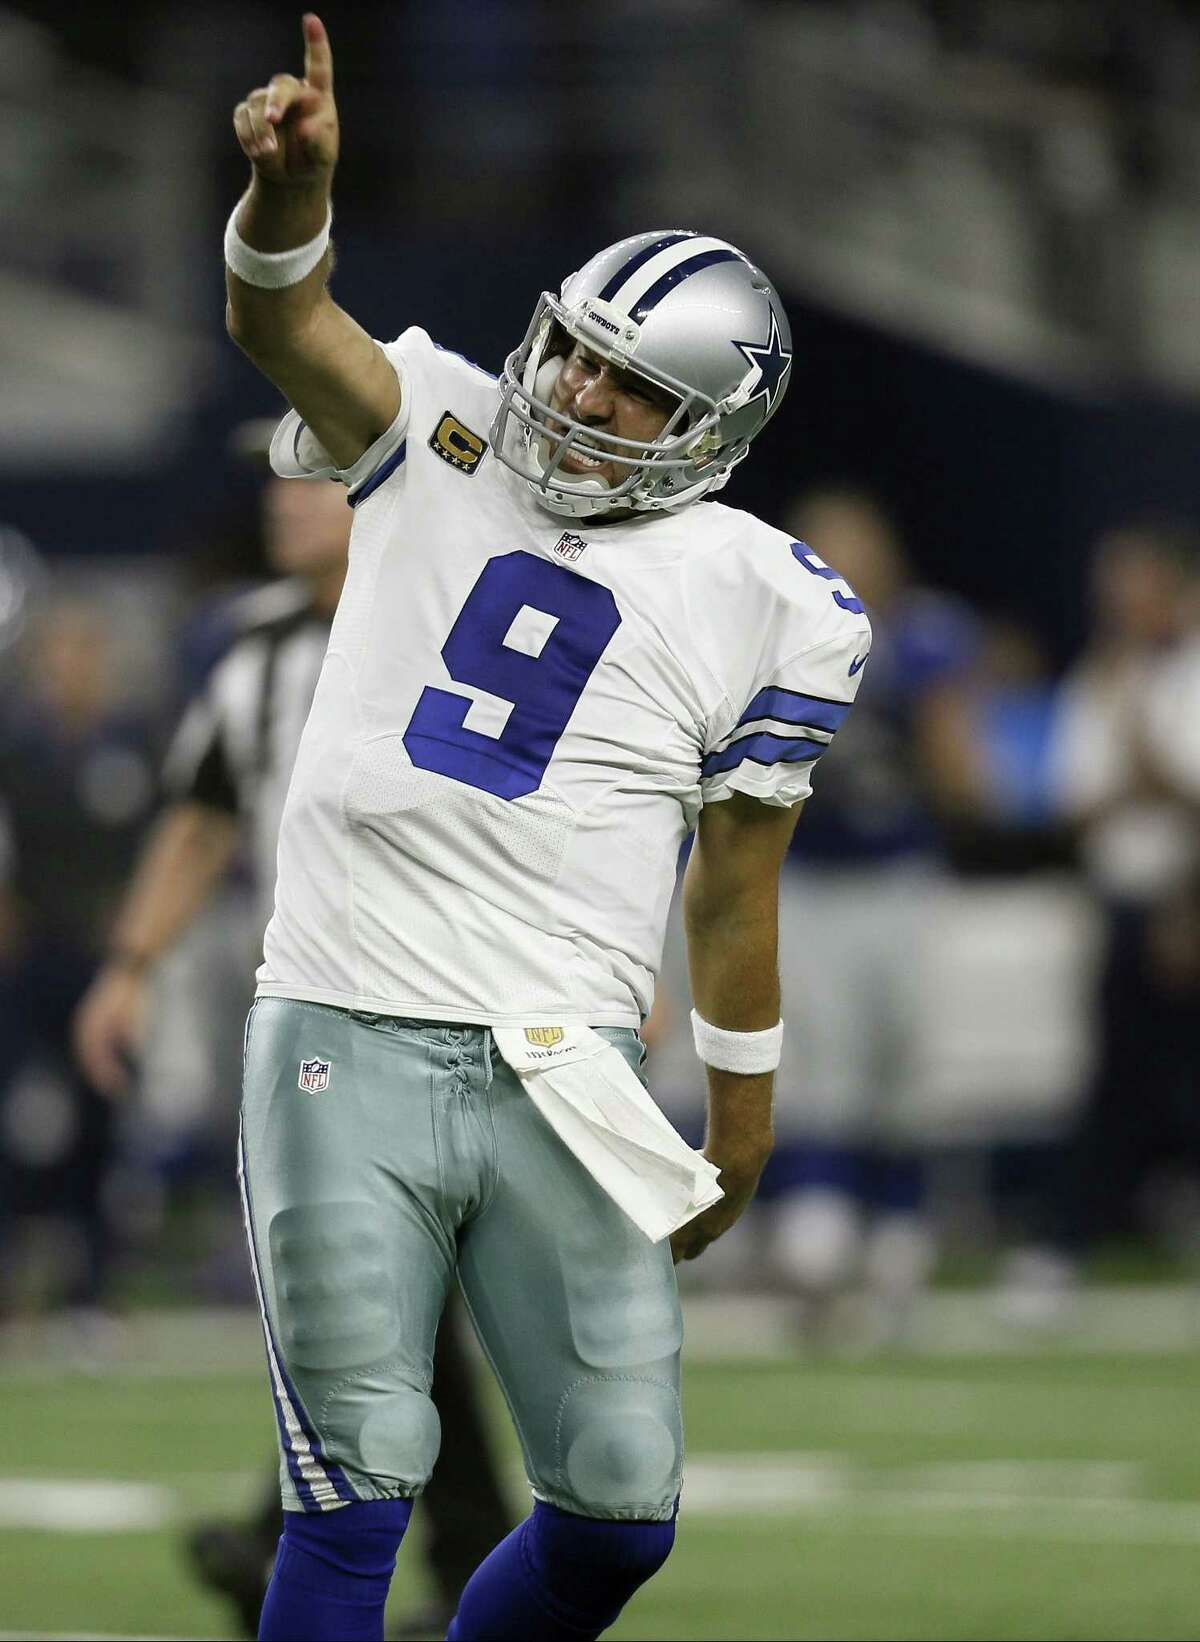 Cowboys quarterback Tony Romo celebrates a late touchdown pass to tight end Jason Witten to beat the Giants on Sunday in Arlington, Texas.